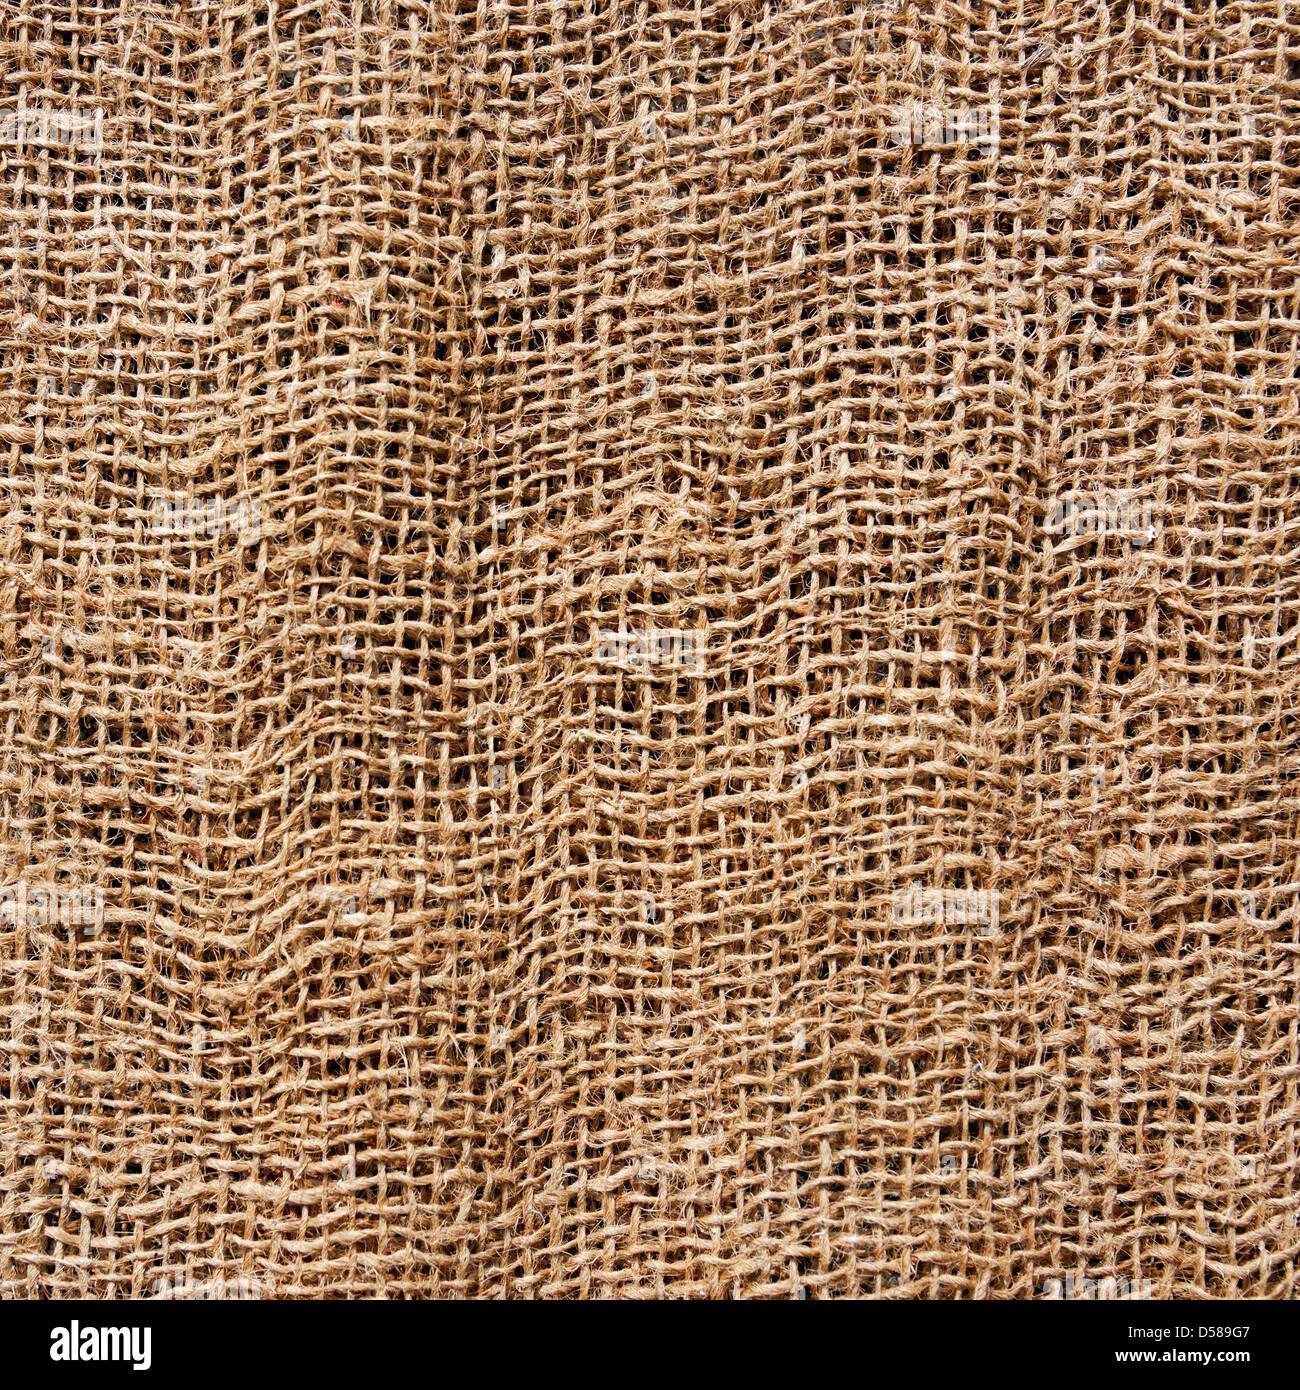 Hessian texture, square photograph - Stock Image